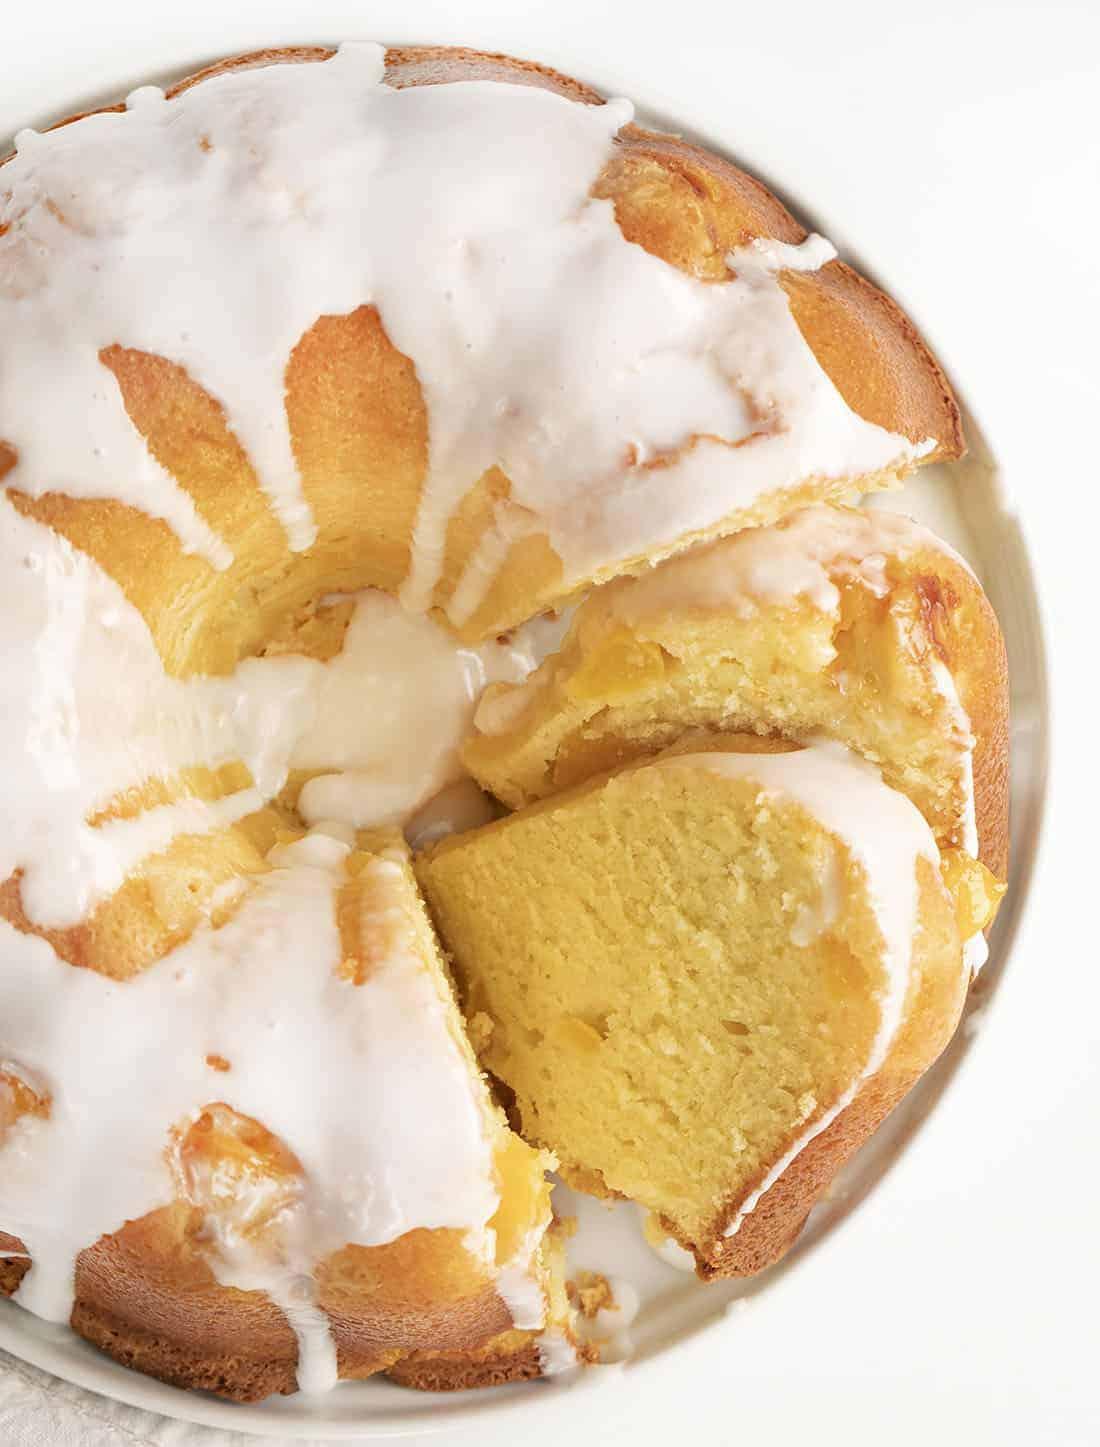 Peach Pound Cake with Vanilla Glaze Cut Into Slices